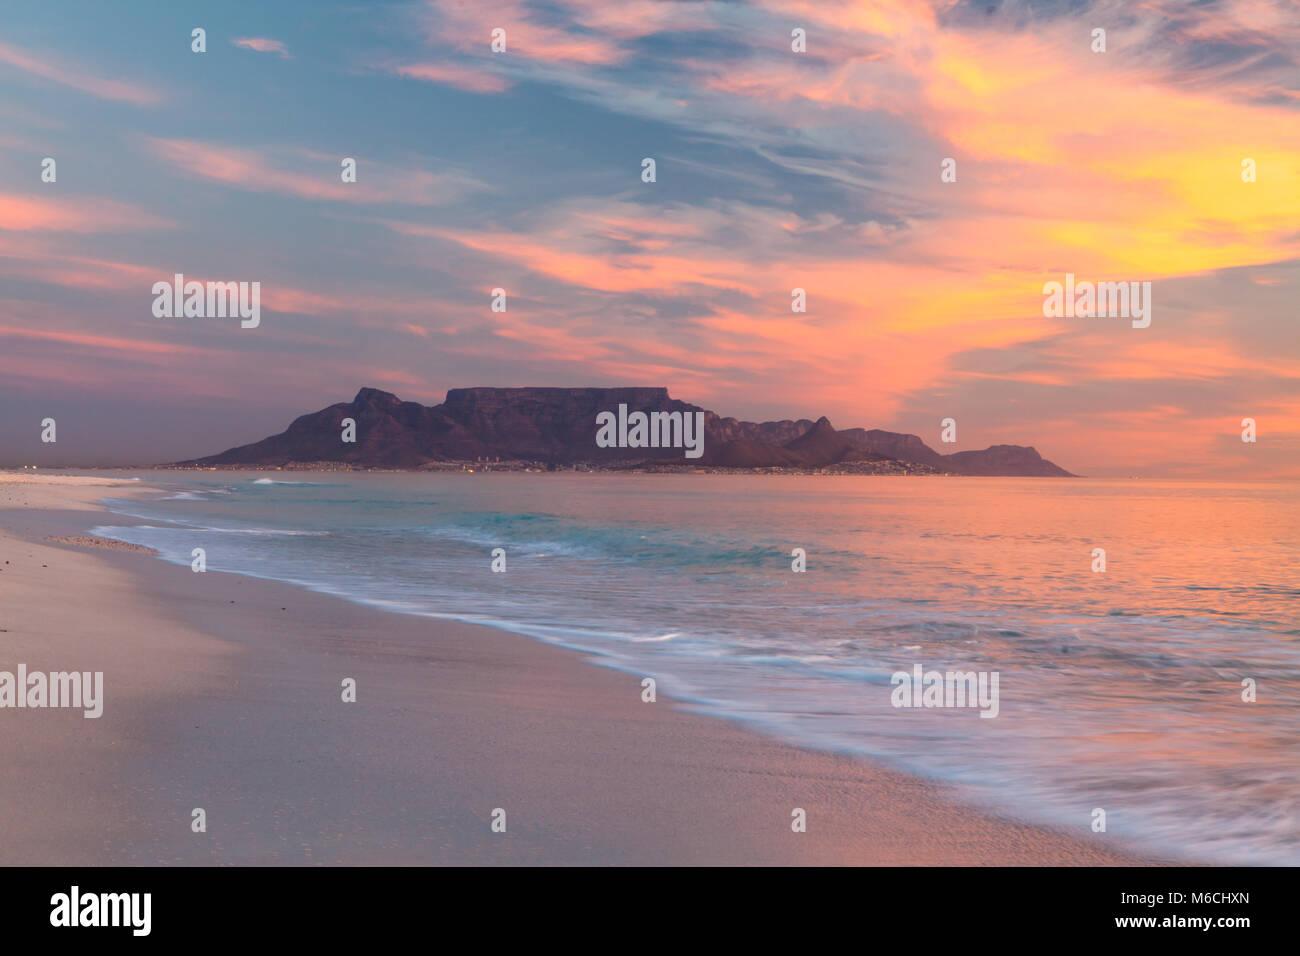 Vista panorámica de la montaña de la mesa Cape Town South Africa de blouberg al atardecer Imagen De Stock